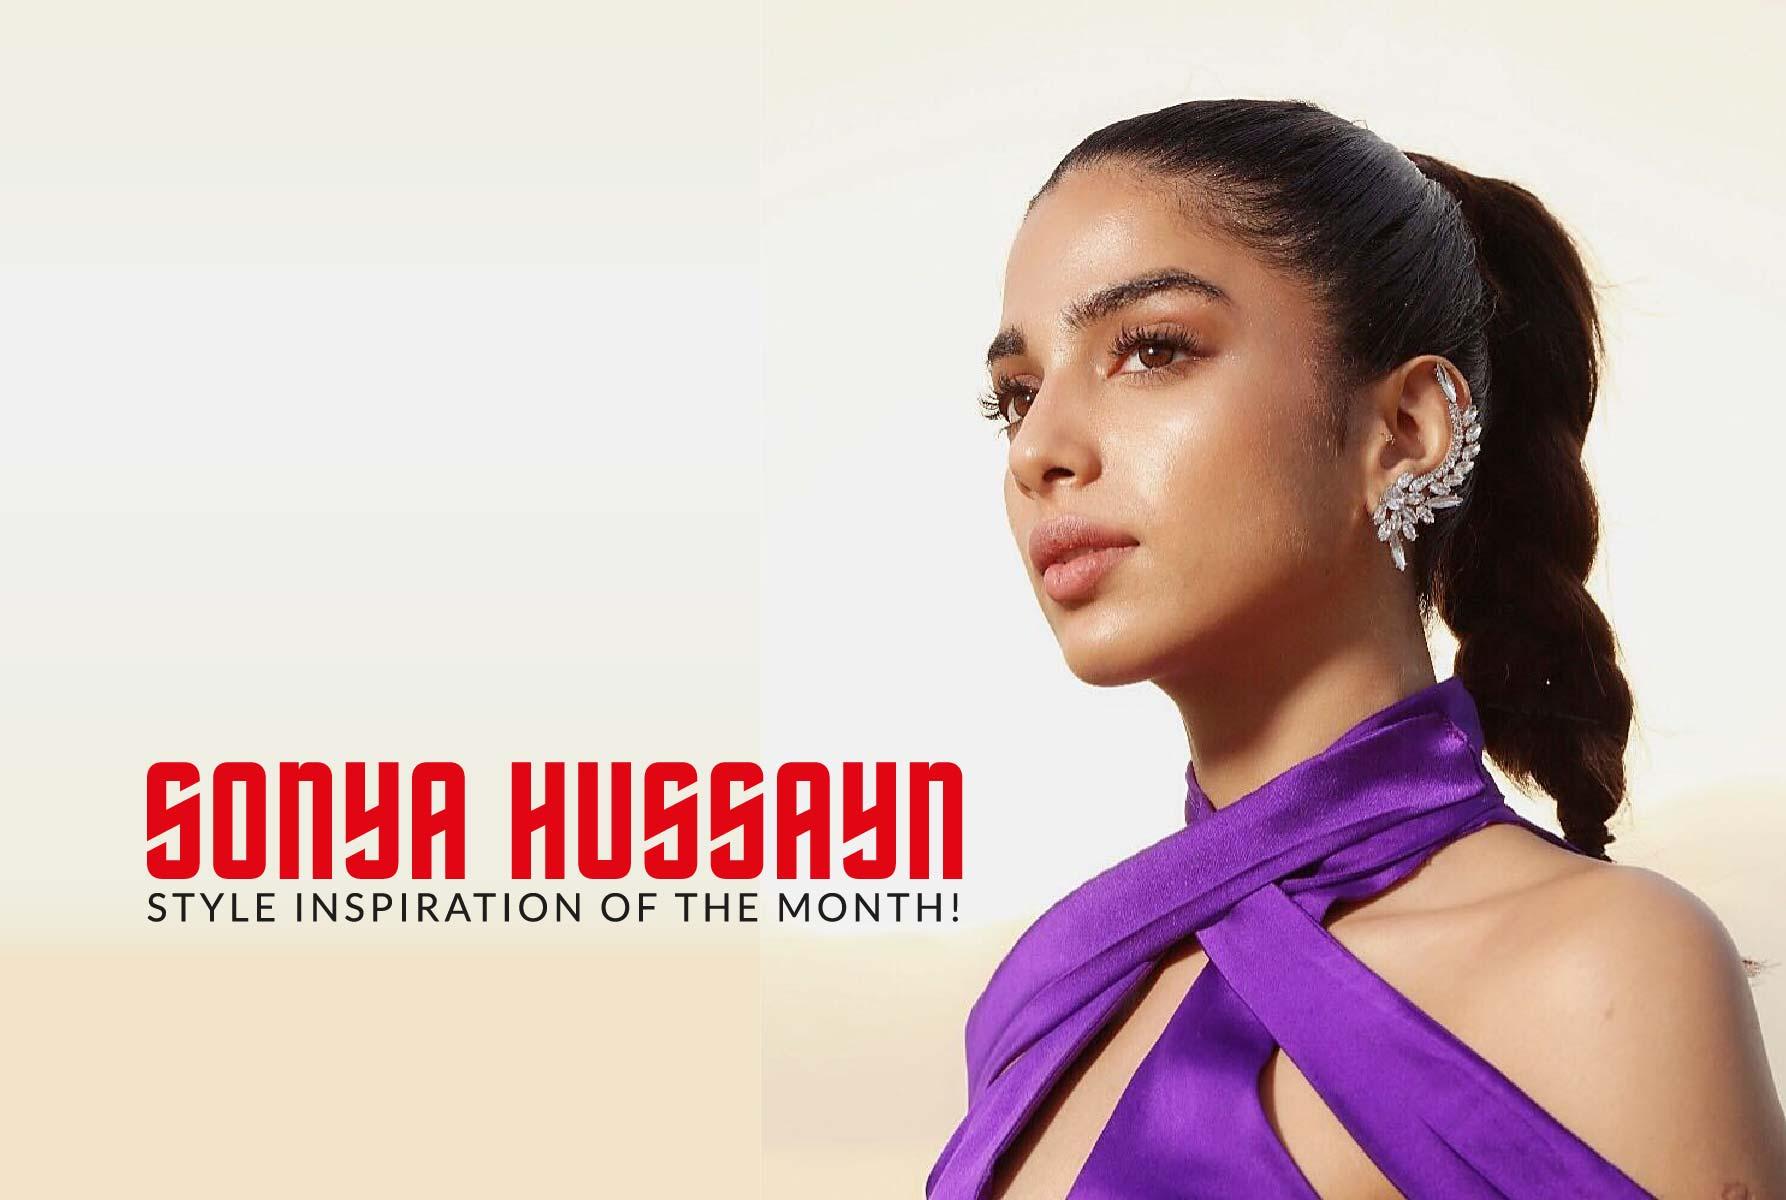 Sonya Hussyn - Style Inspiration